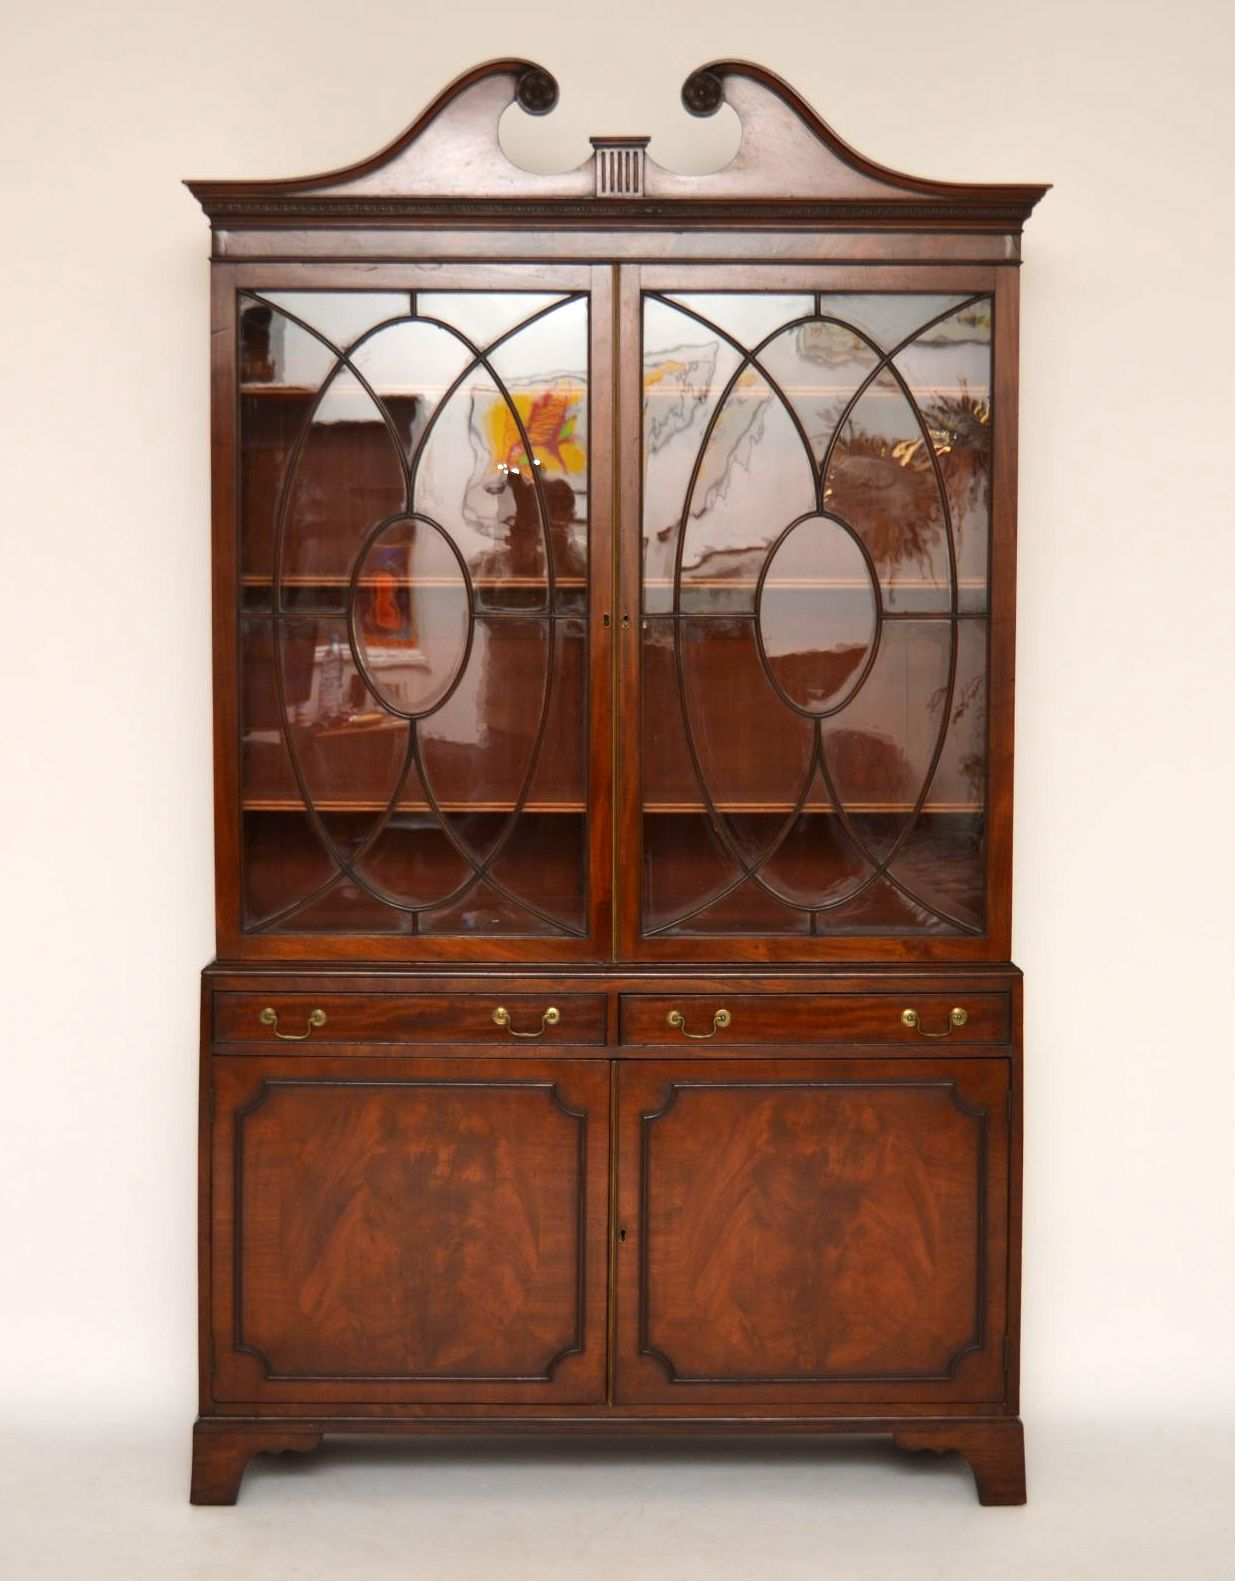 gro e antike mahagoni vitrine. Black Bedroom Furniture Sets. Home Design Ideas